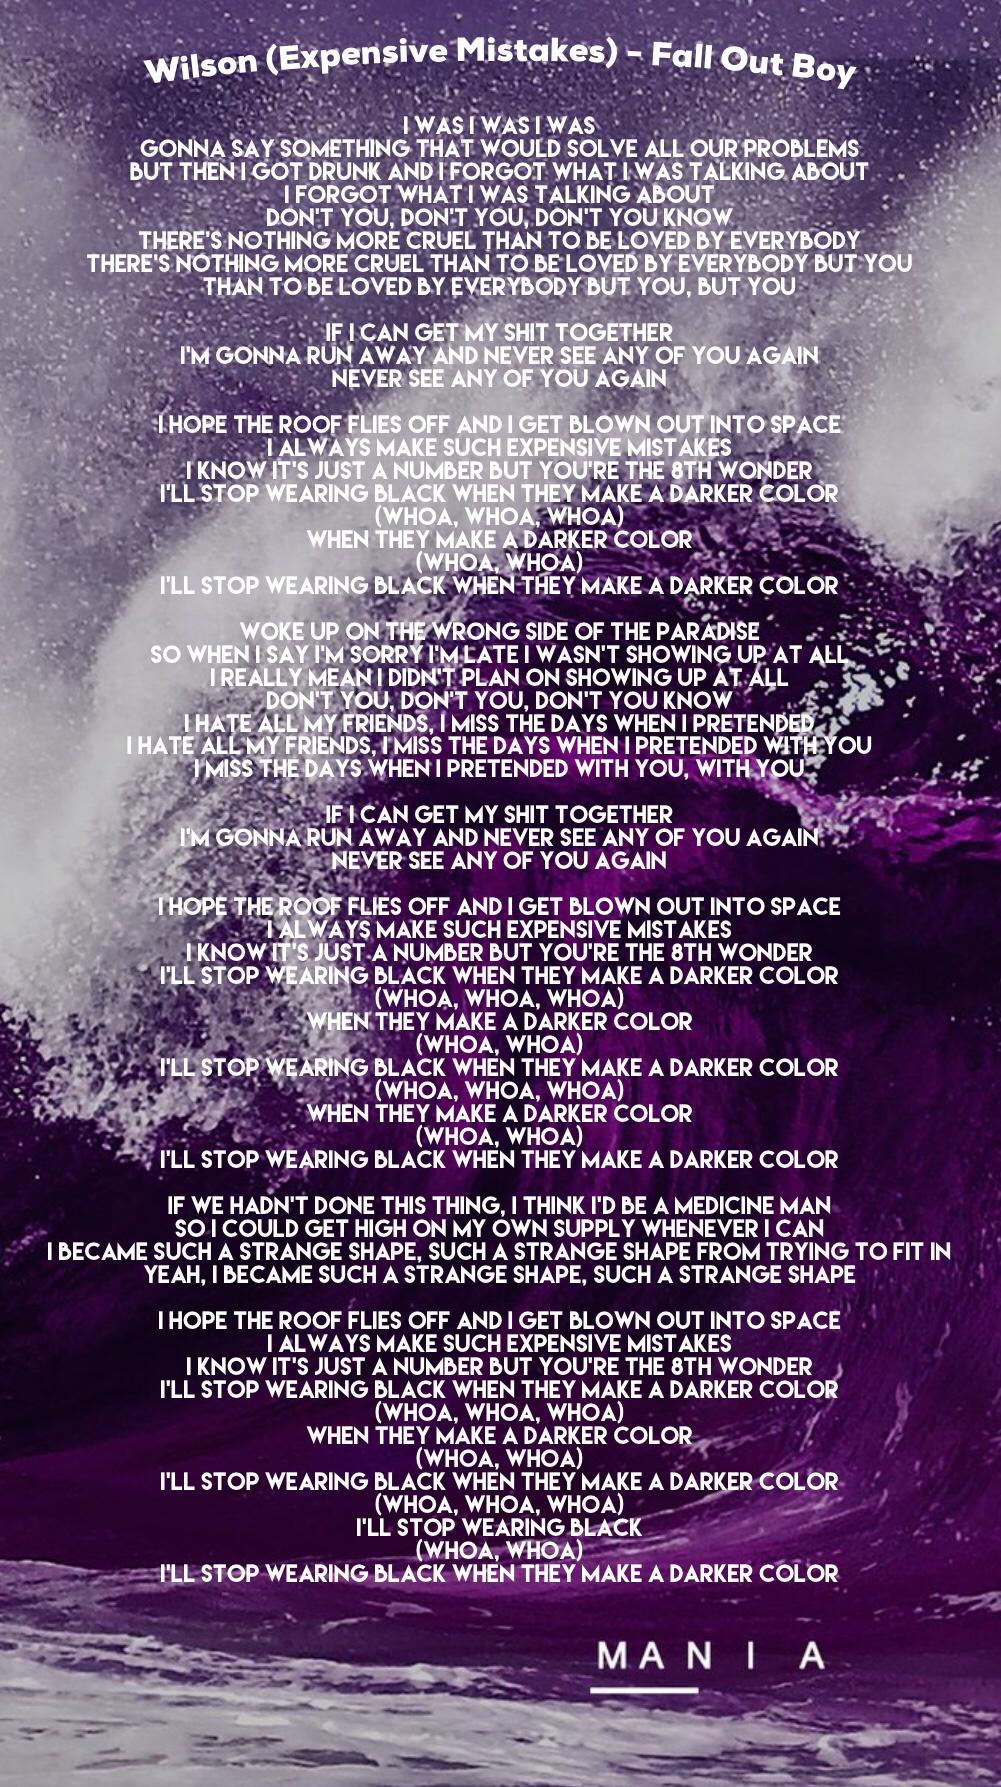 Fall Out Boy Wilson Expensive Mistakes M A N I A Lyrics